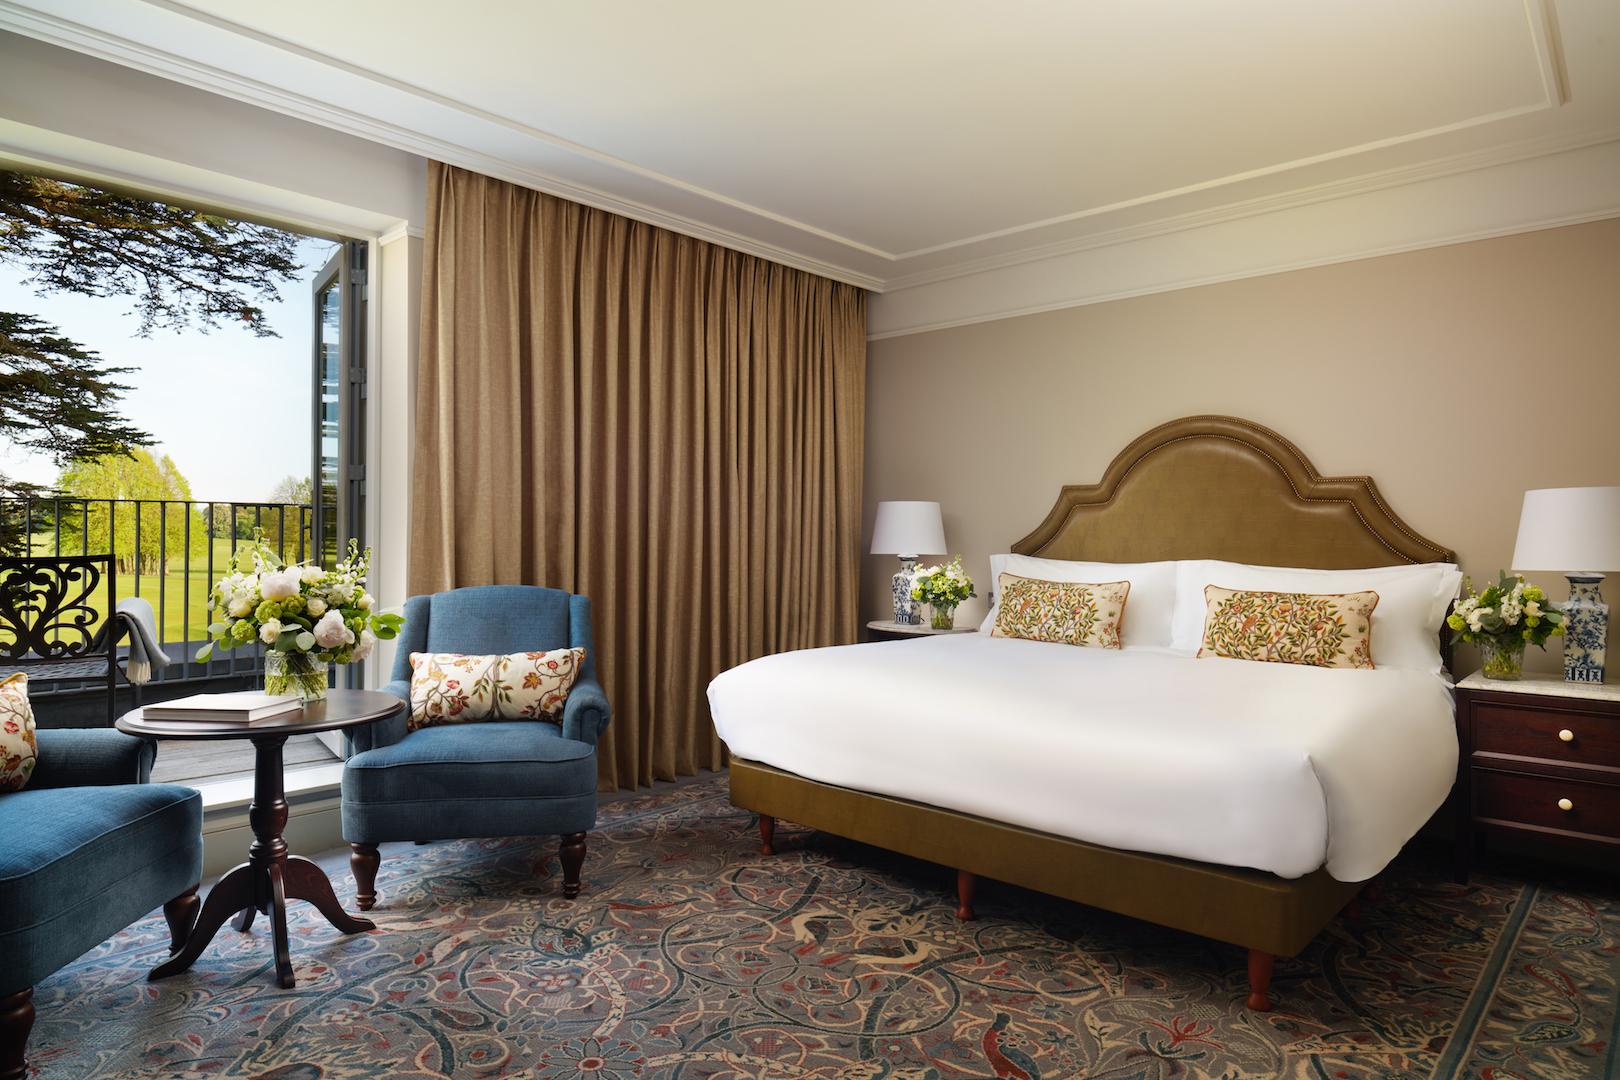 Carton House - Fairmont Balcony King room (Fairmont Hotels)